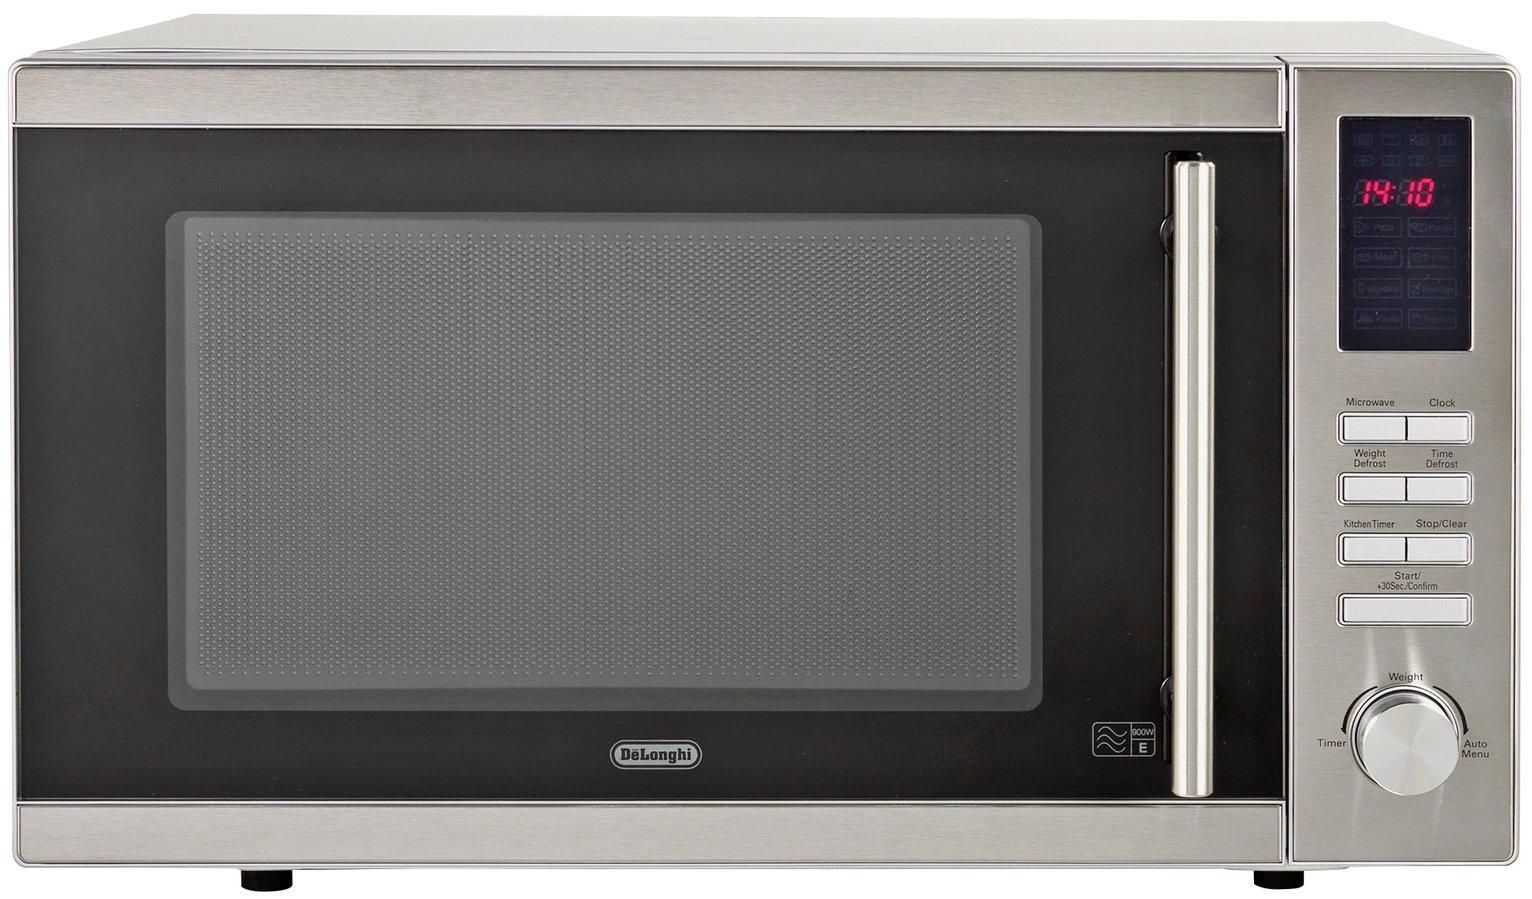 DeLonghi - Standard Microwave -AM9 -Silver